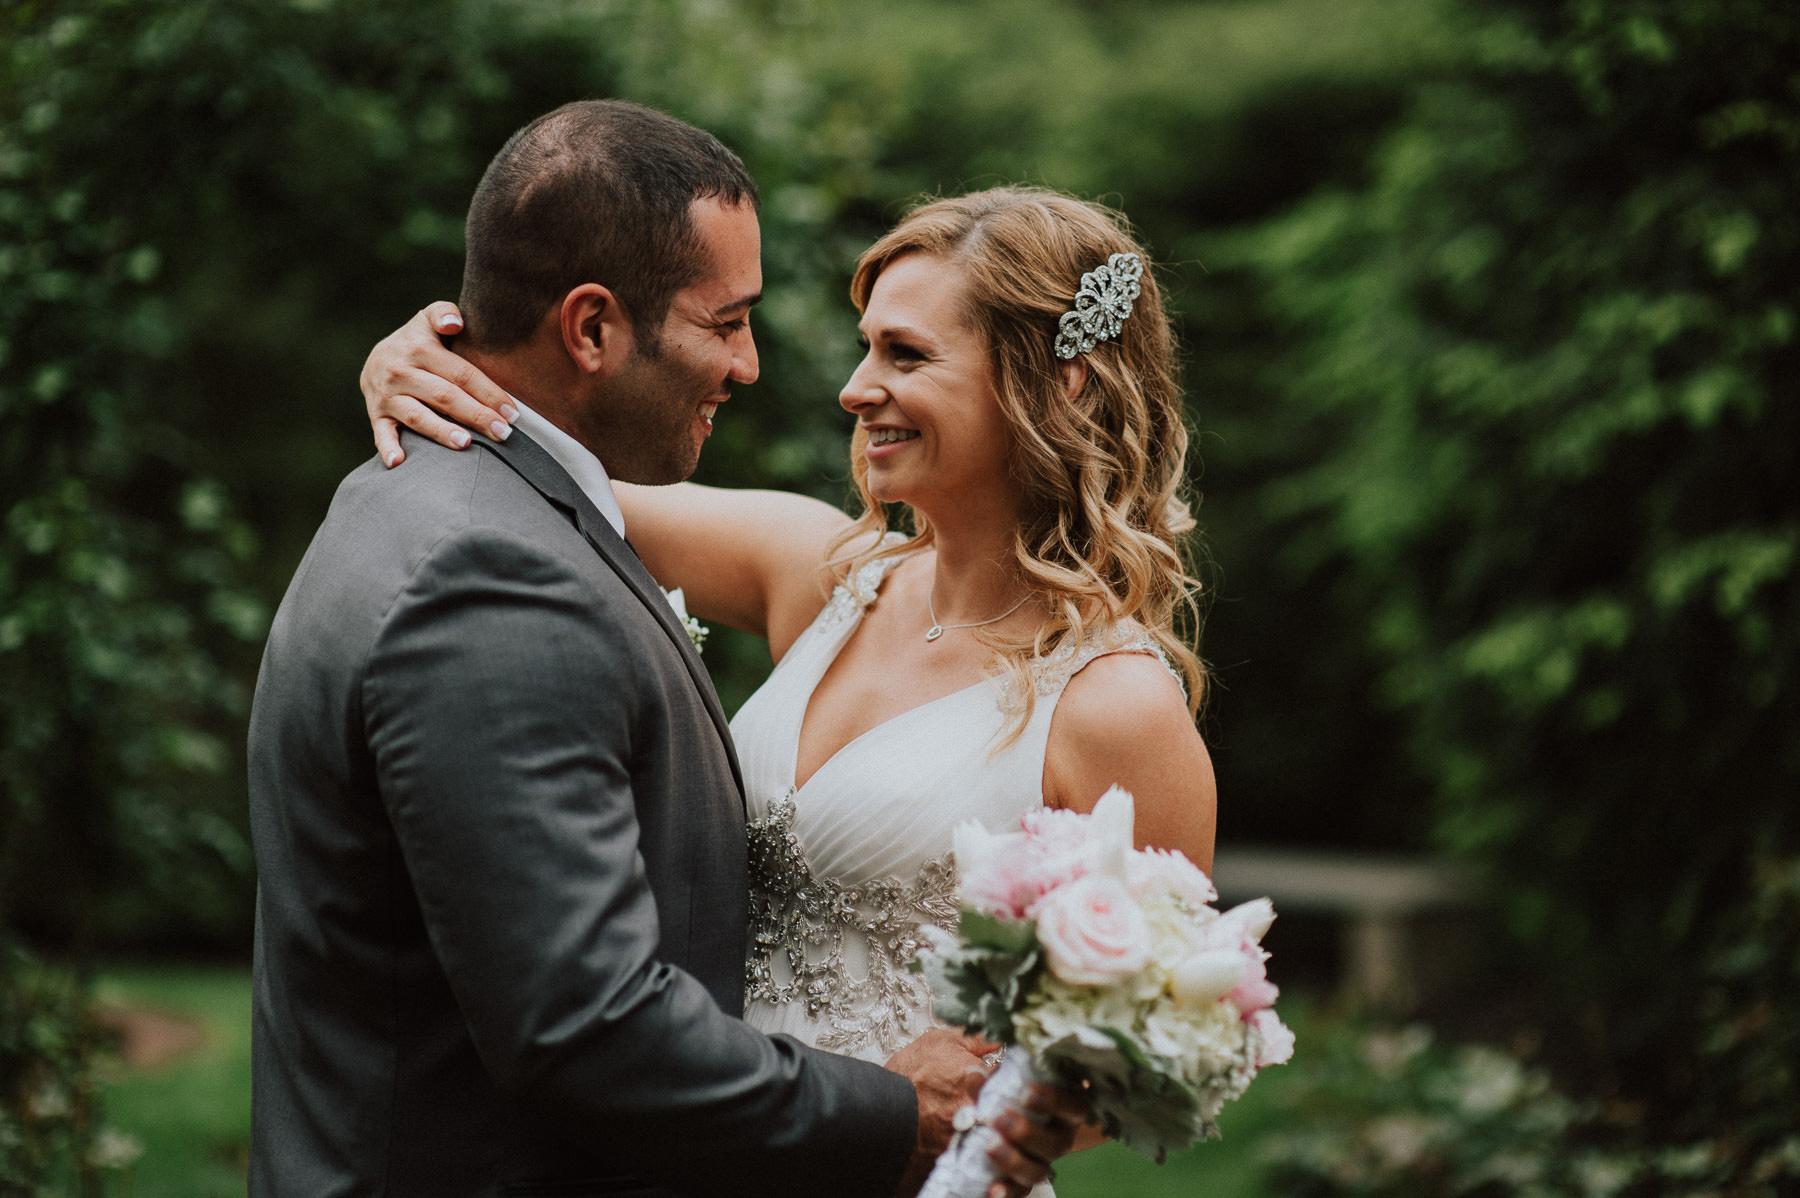 appleford-estate-wedding-photography-31.jpg